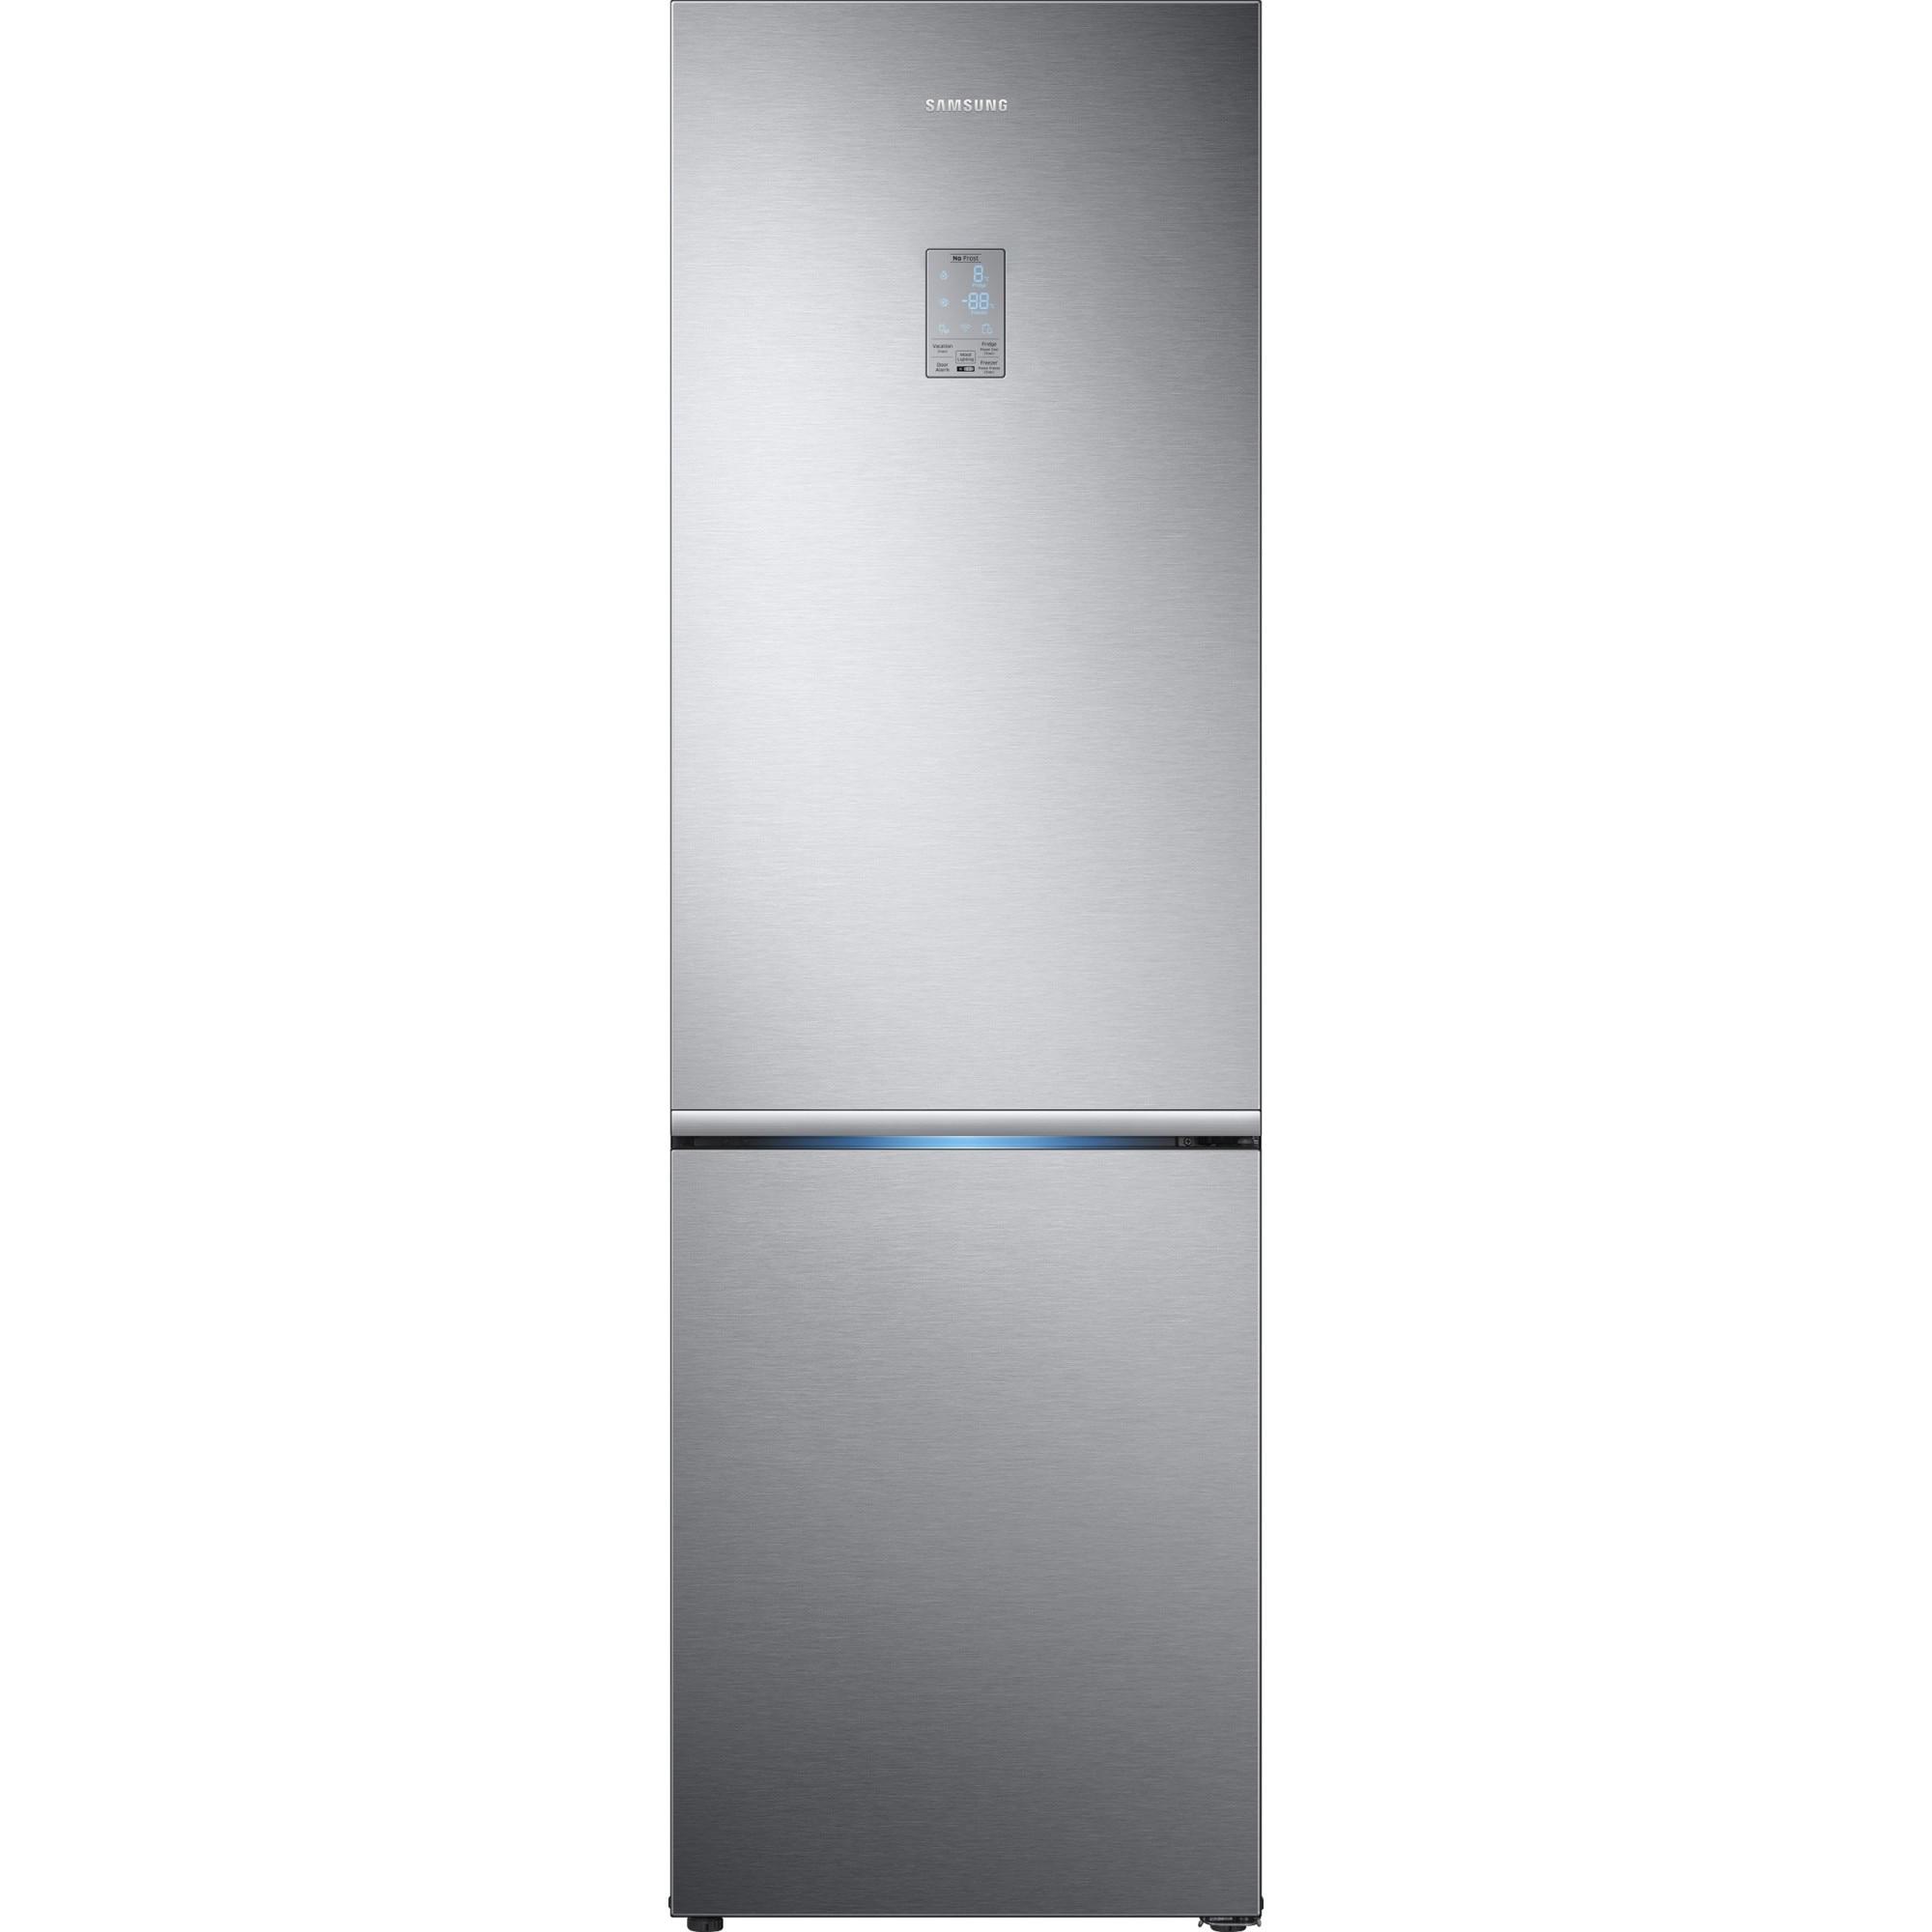 Fotografie Combina frigorifica Samsung RB34K6032SS/EF, 344 l, Clasa A++, Full NoFrost, Compresor Digital Inverter, Display, H 191 cm, Inox